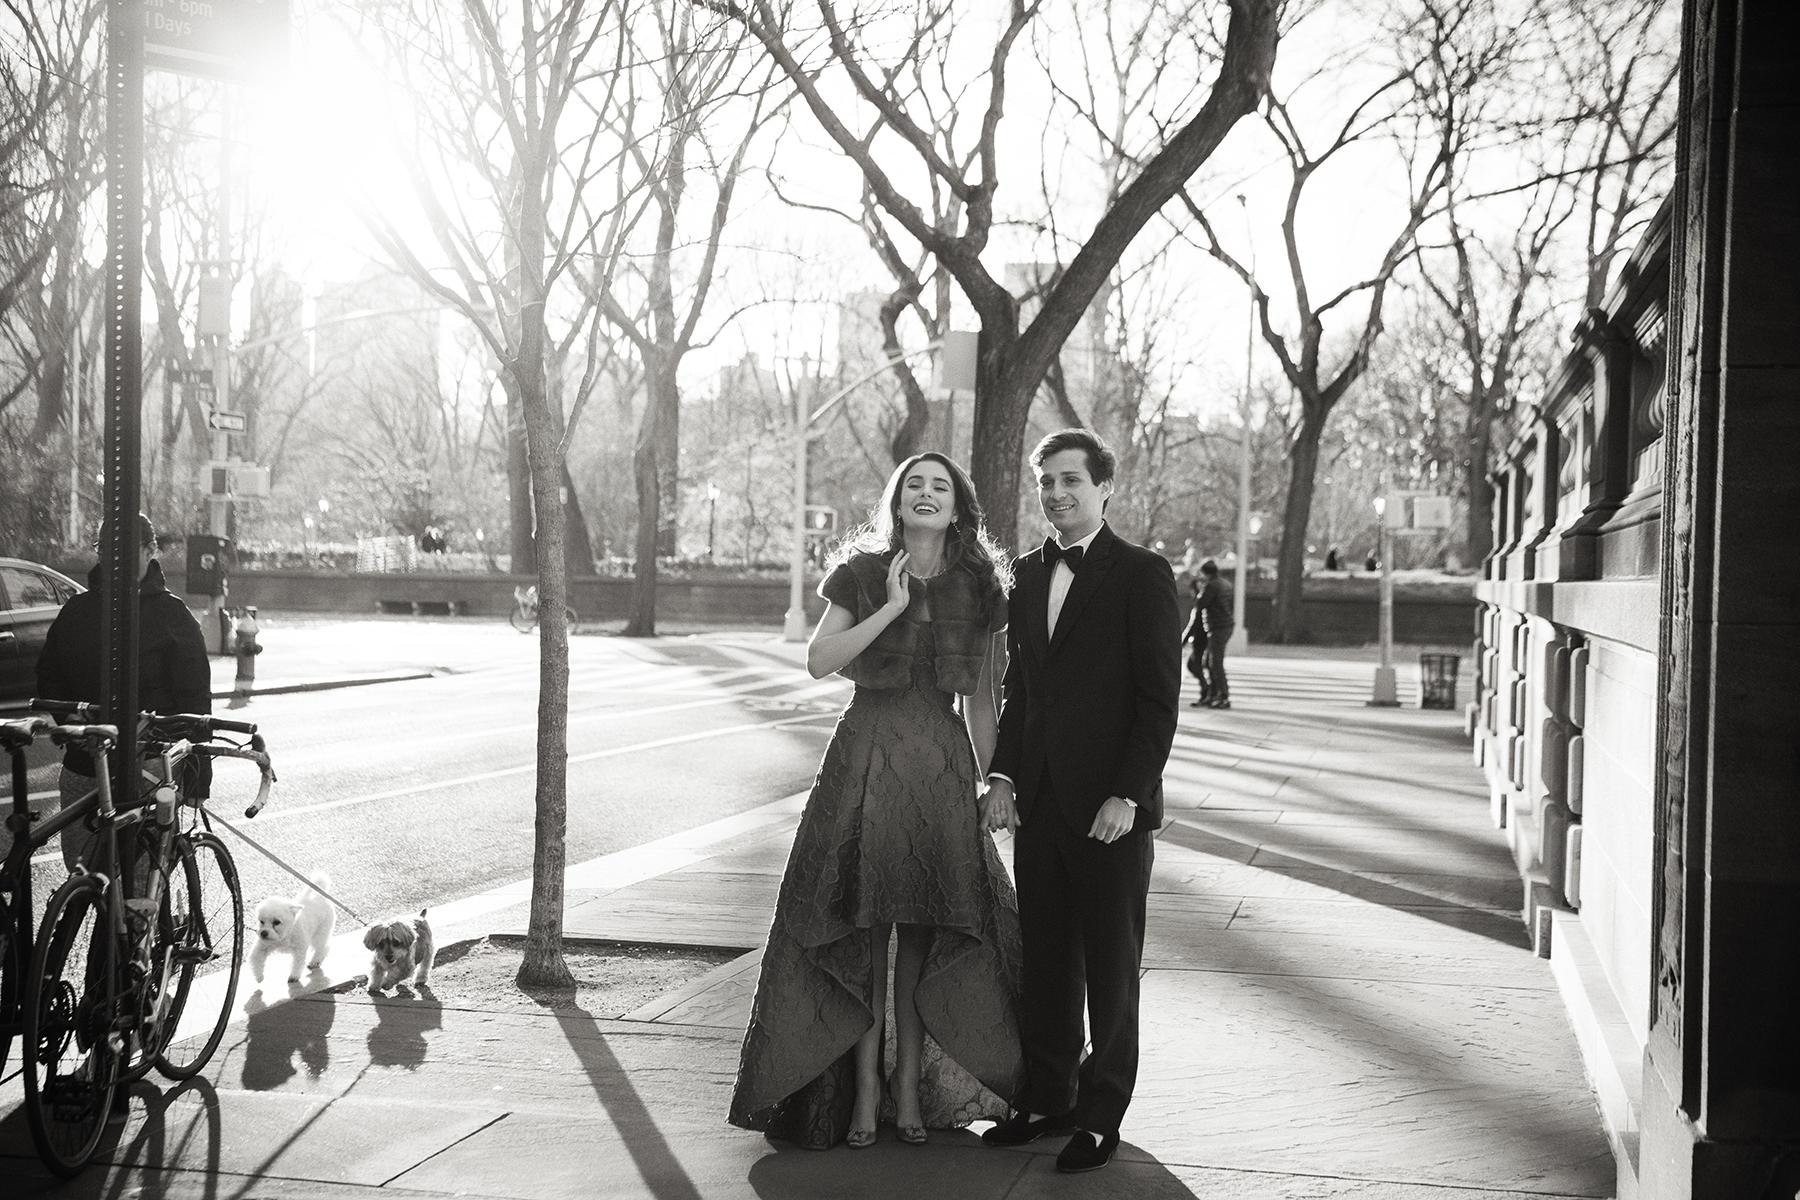 raquelreis_wedding_photography_frickcollection_006.jpg